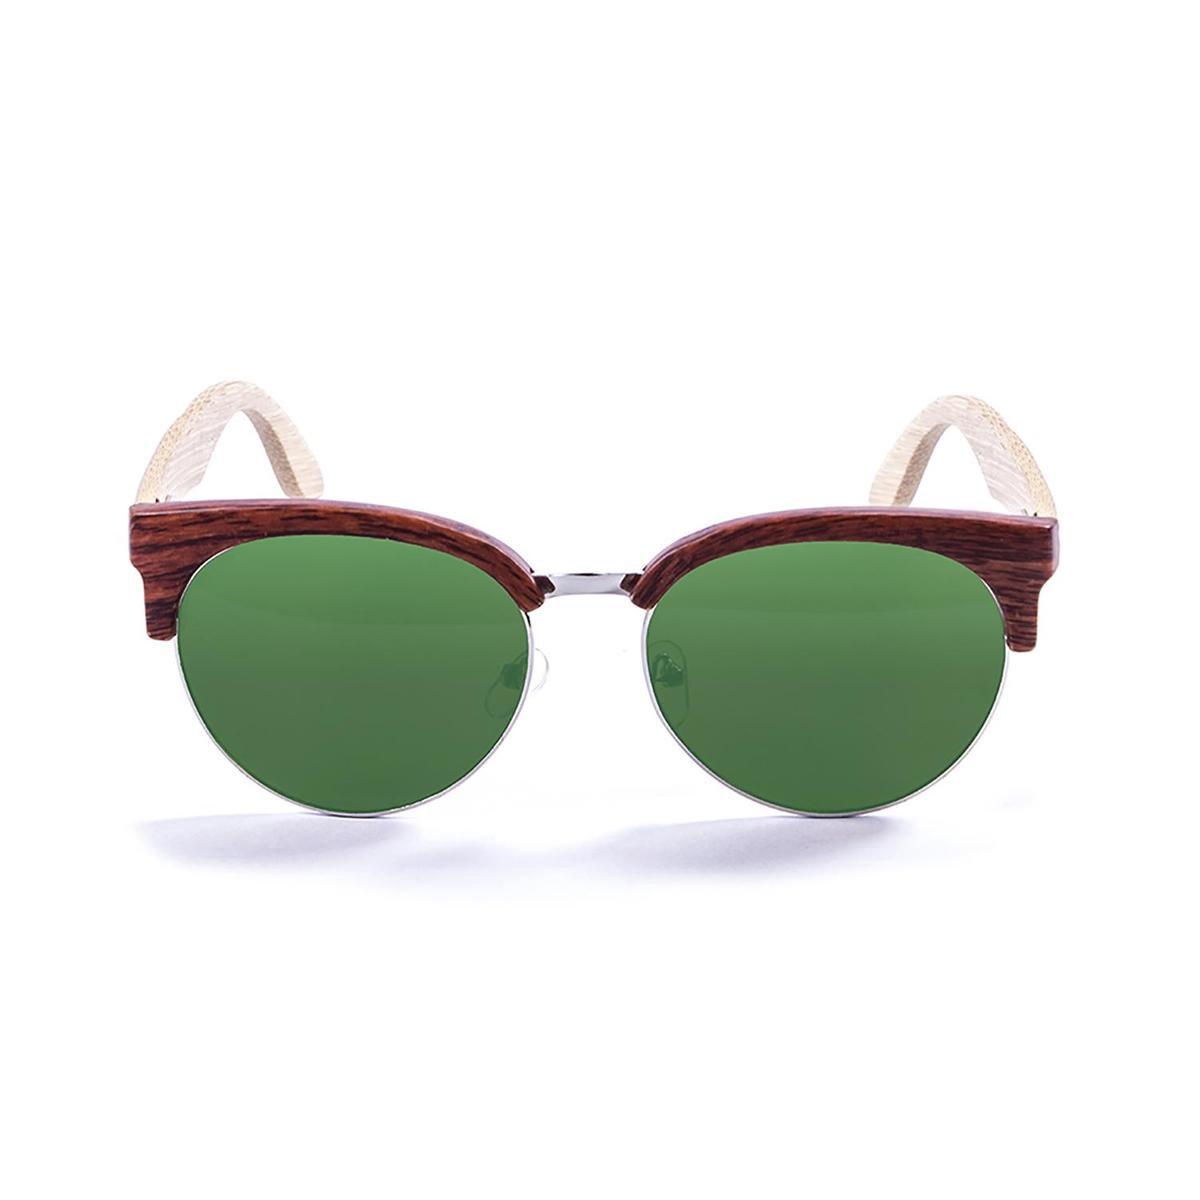 Ocean Sunglasses - MEDANO - Unisex Zonnebril Bruin - Ocean Sunglasses